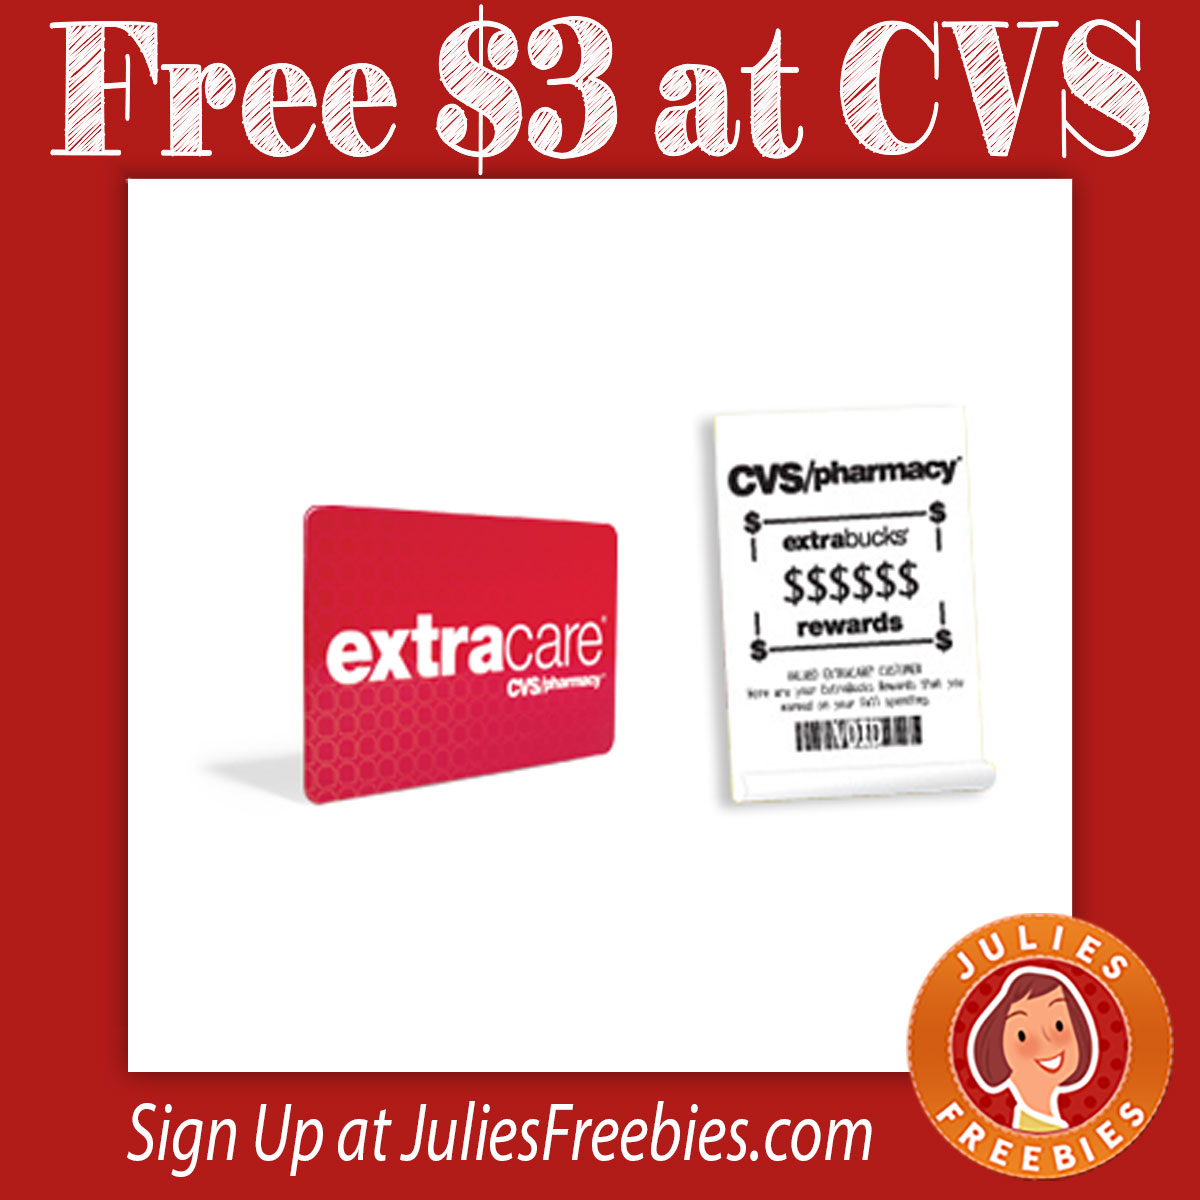 free 3 extracare bucks at cvs julie 39 s freebies. Black Bedroom Furniture Sets. Home Design Ideas